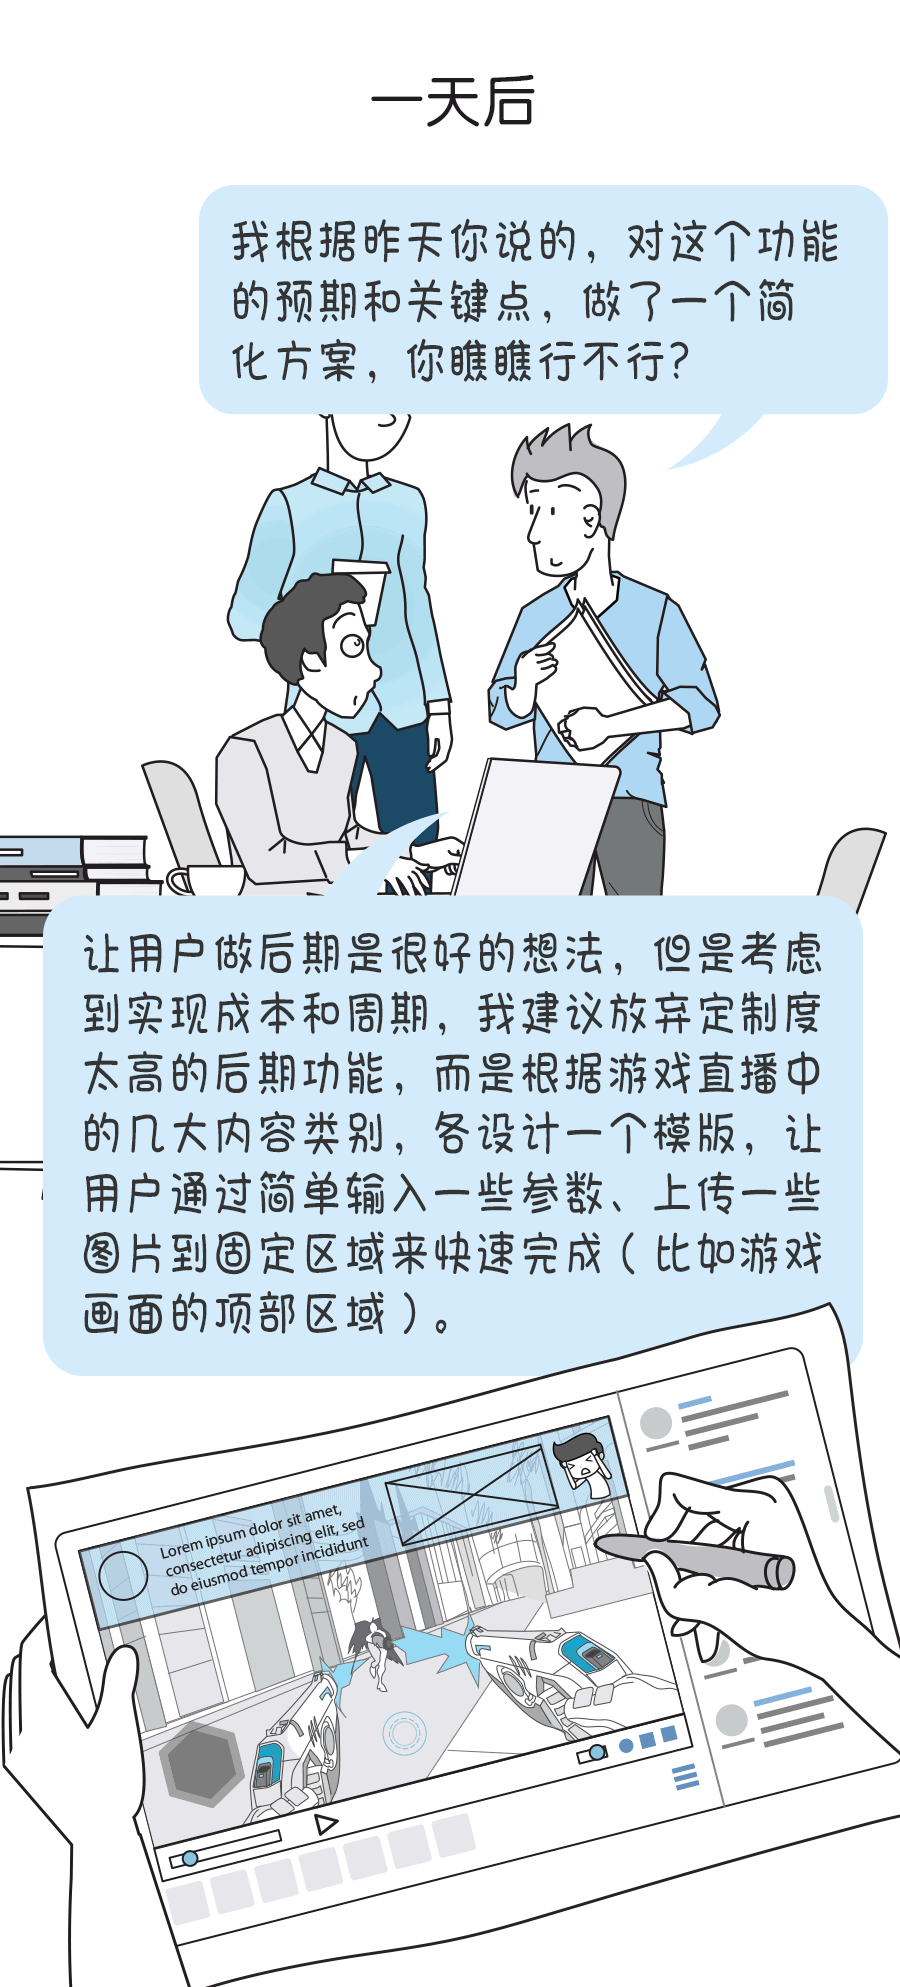 qiniu_08_26